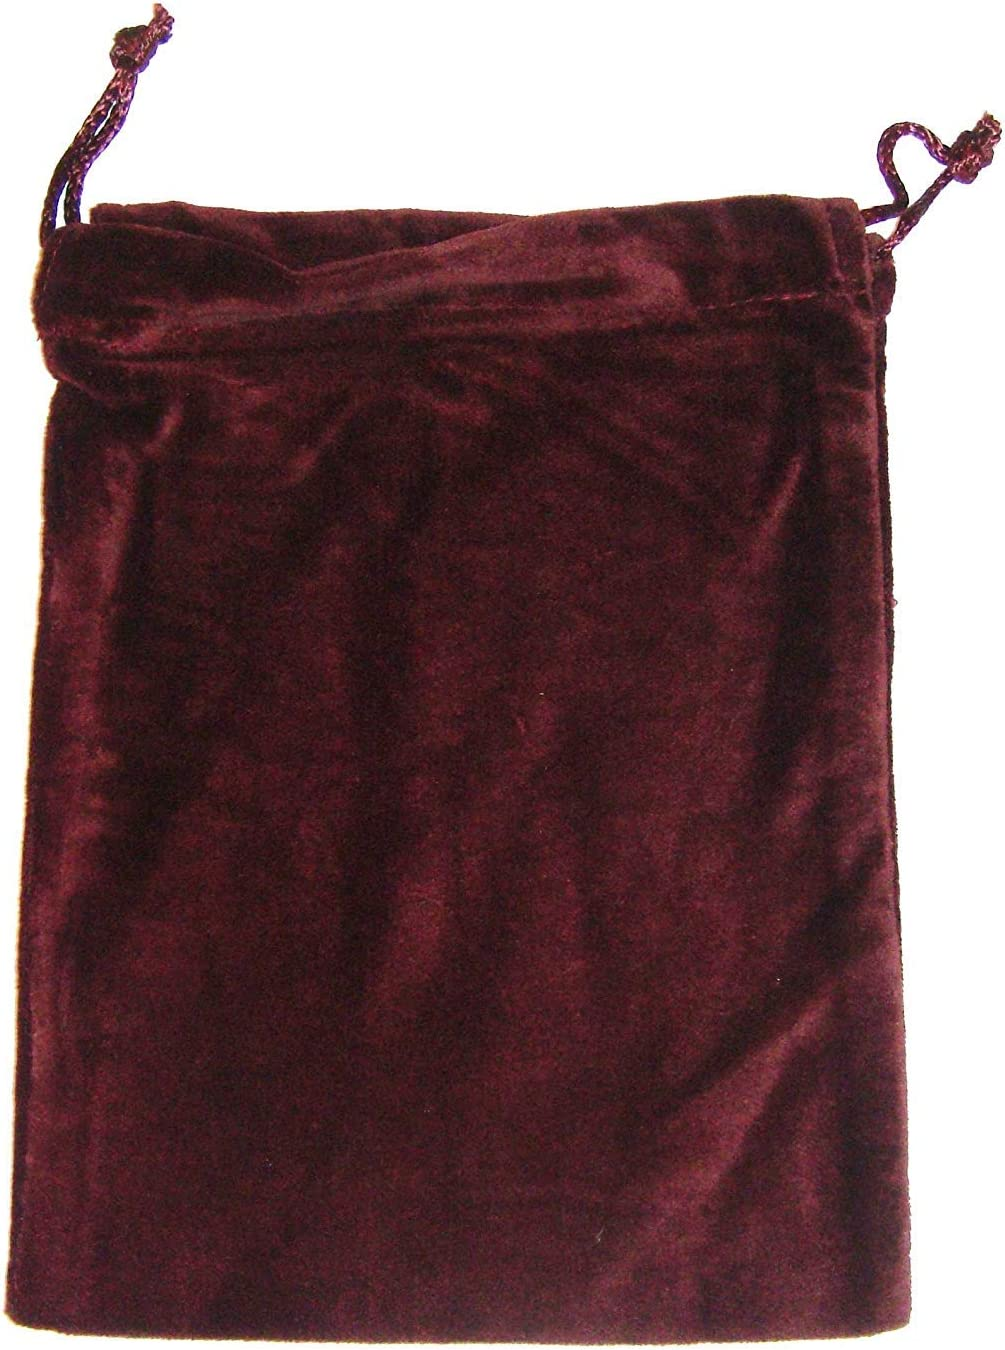 Drawstring Closure Adult Cremation Urn Burgundy Velvet Urn Bag Premium Quality